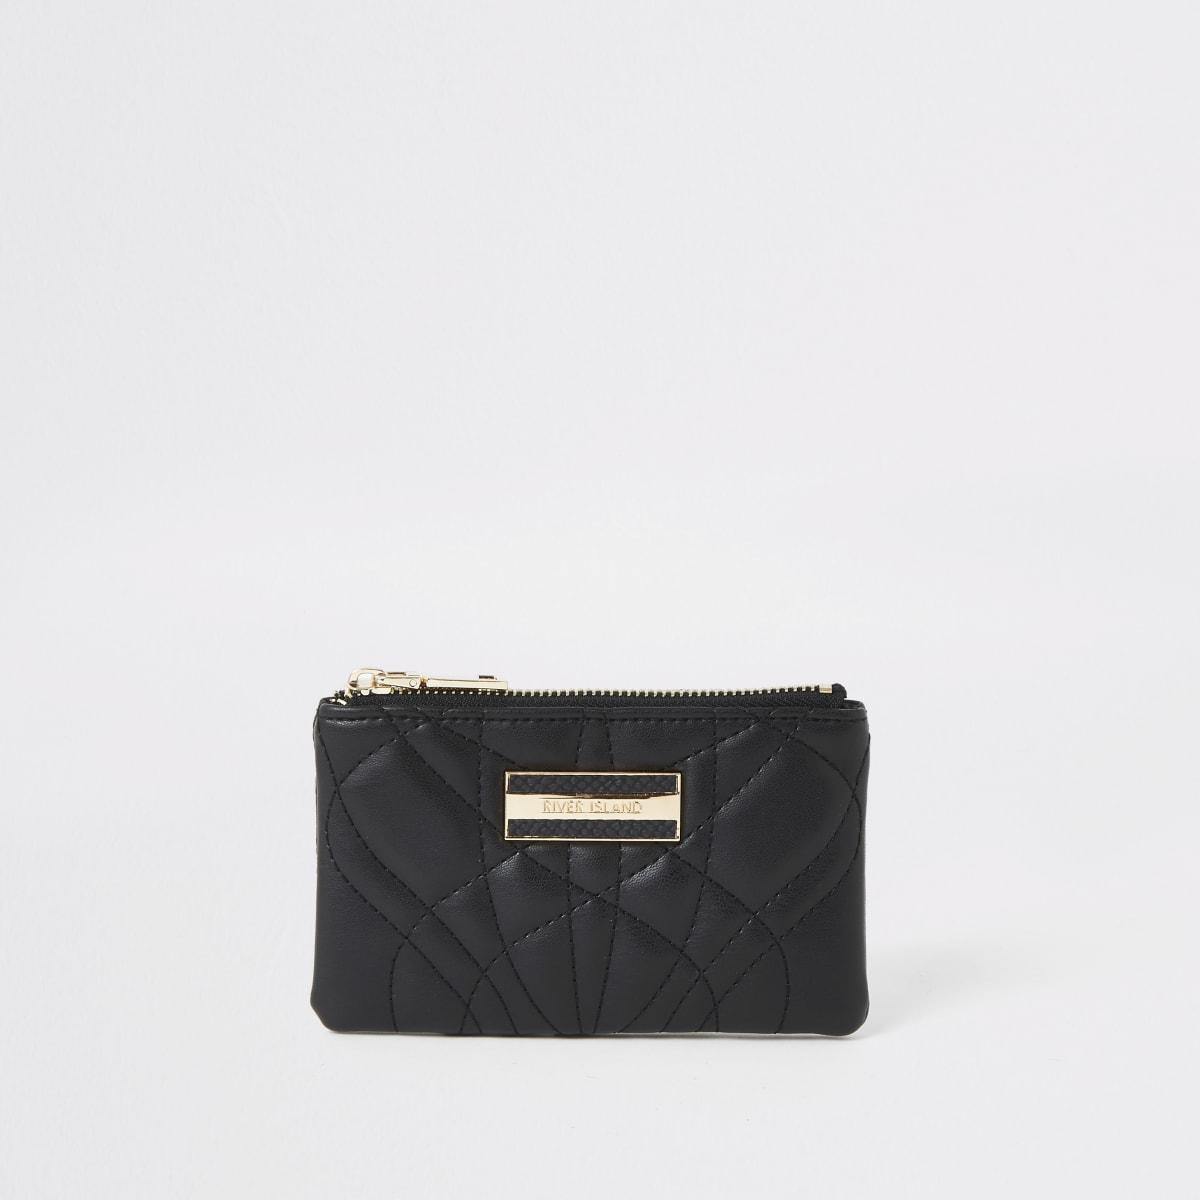 Mini pochette matelassée noire